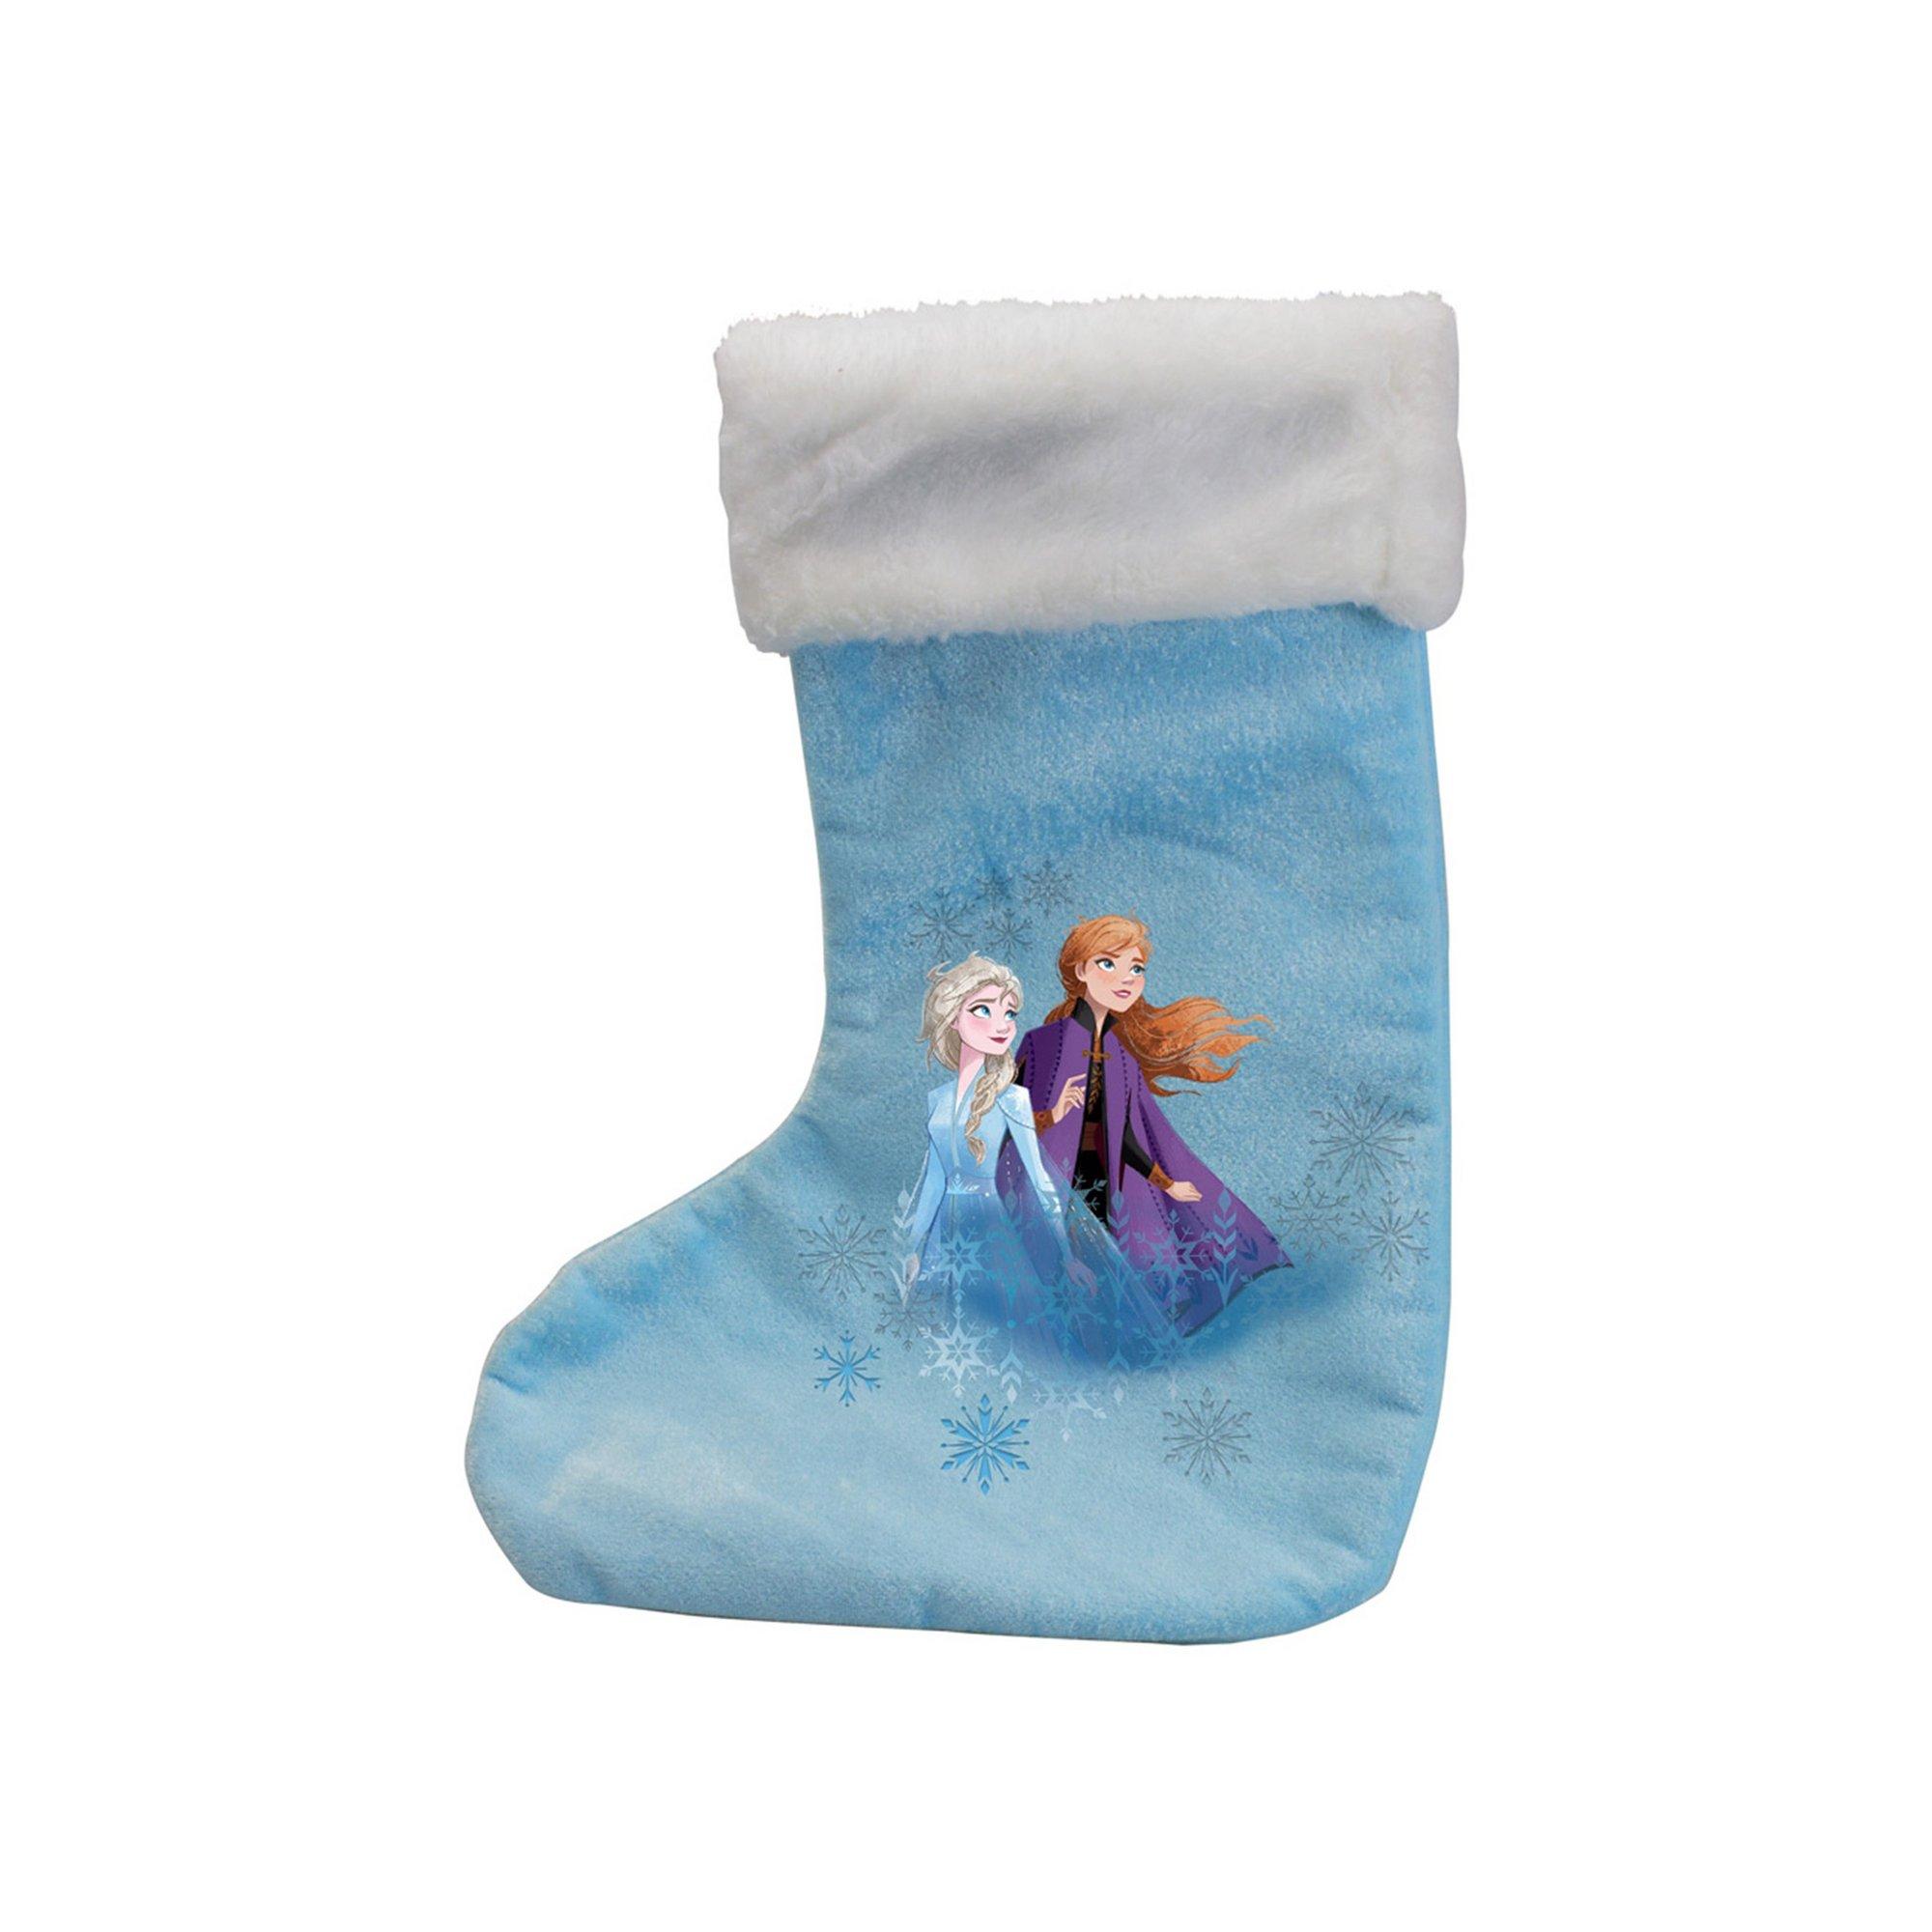 Image of Disney Frozen II Filled Christmas Stocking